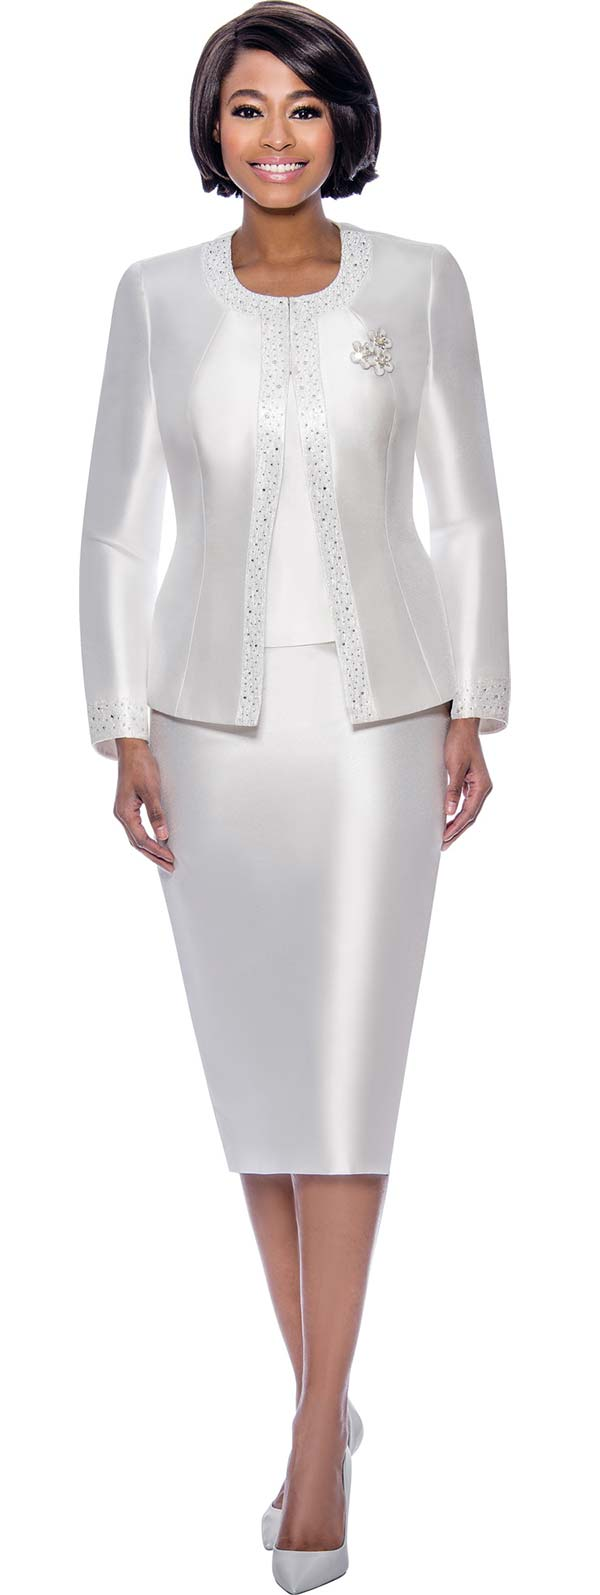 Terramina 7637-White - Womens Church Suit With Embellished Trim On Jacket